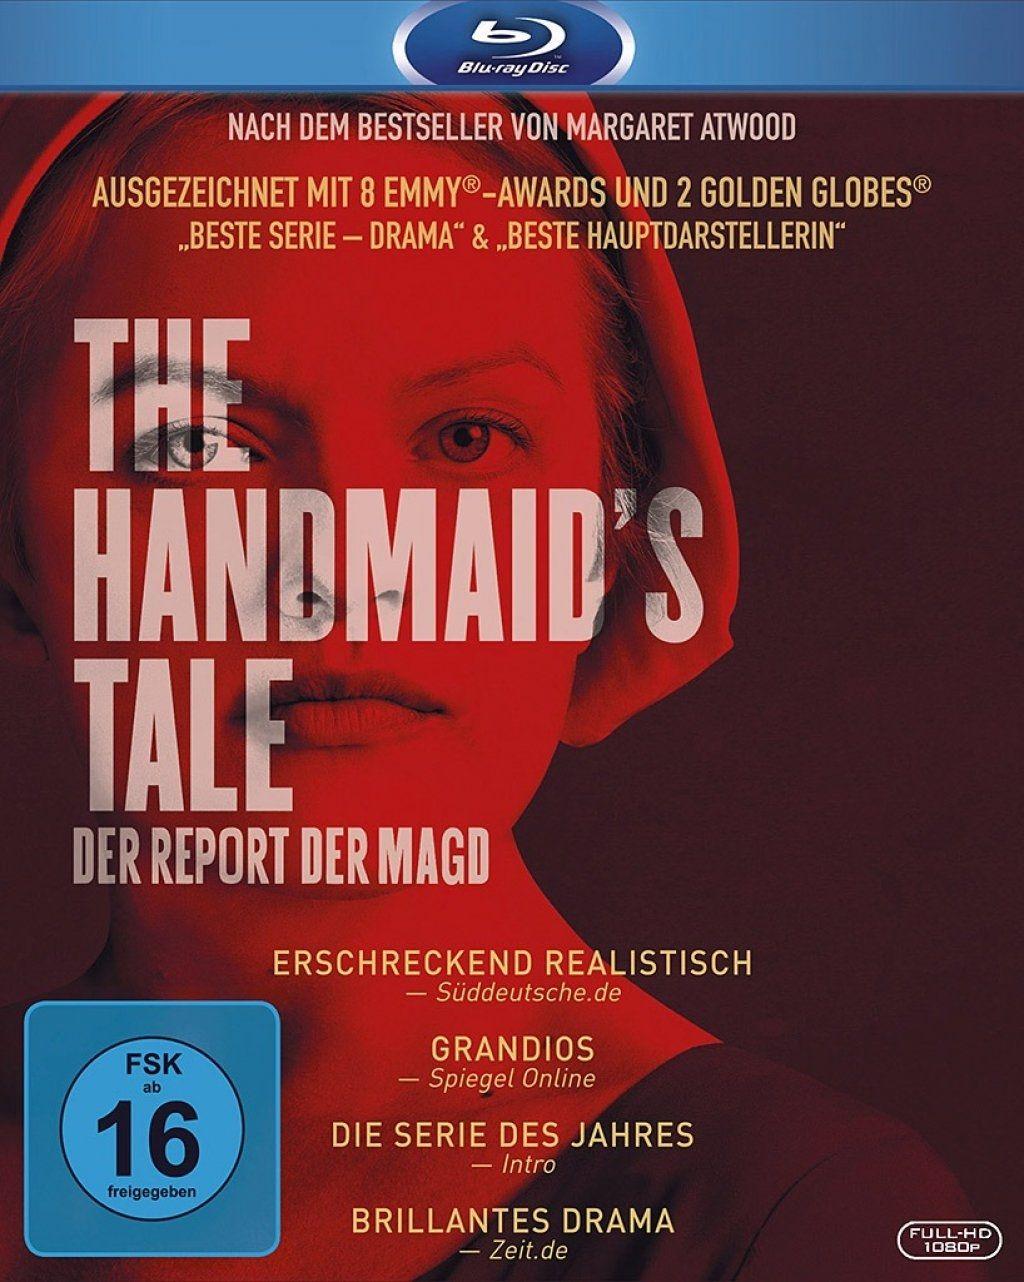 Handmaid's Tale, The - Der Report der Magd - Staffel 1 (3 Discs) (BLURAY)